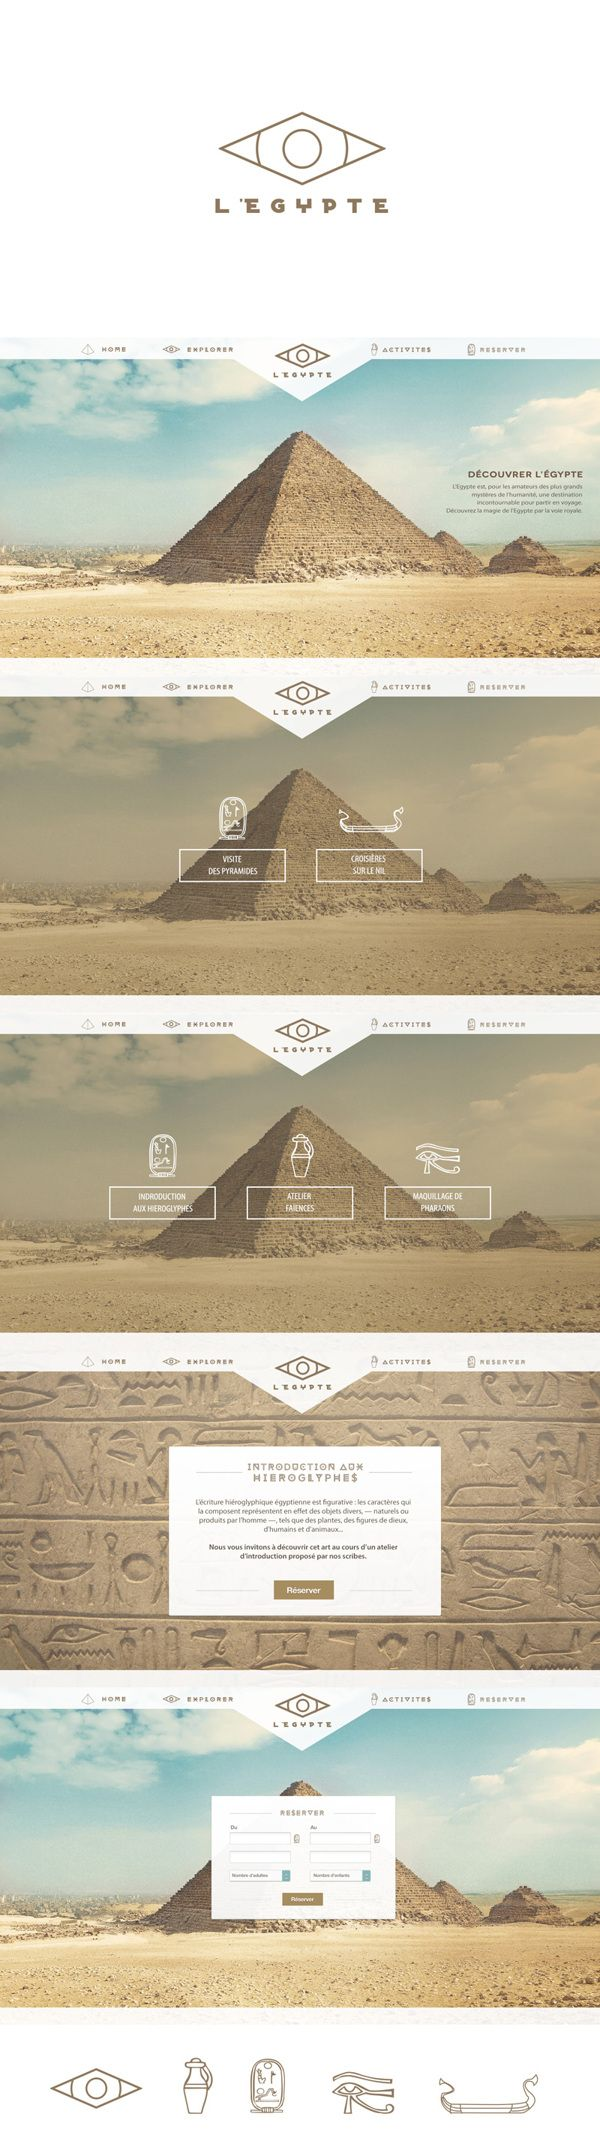 Best Web Design On The Internet Egypt Webdesign Websitedesign Website Design Http Www Pinterest Com Alde Interactive Design Egypt Web Design Inspiration